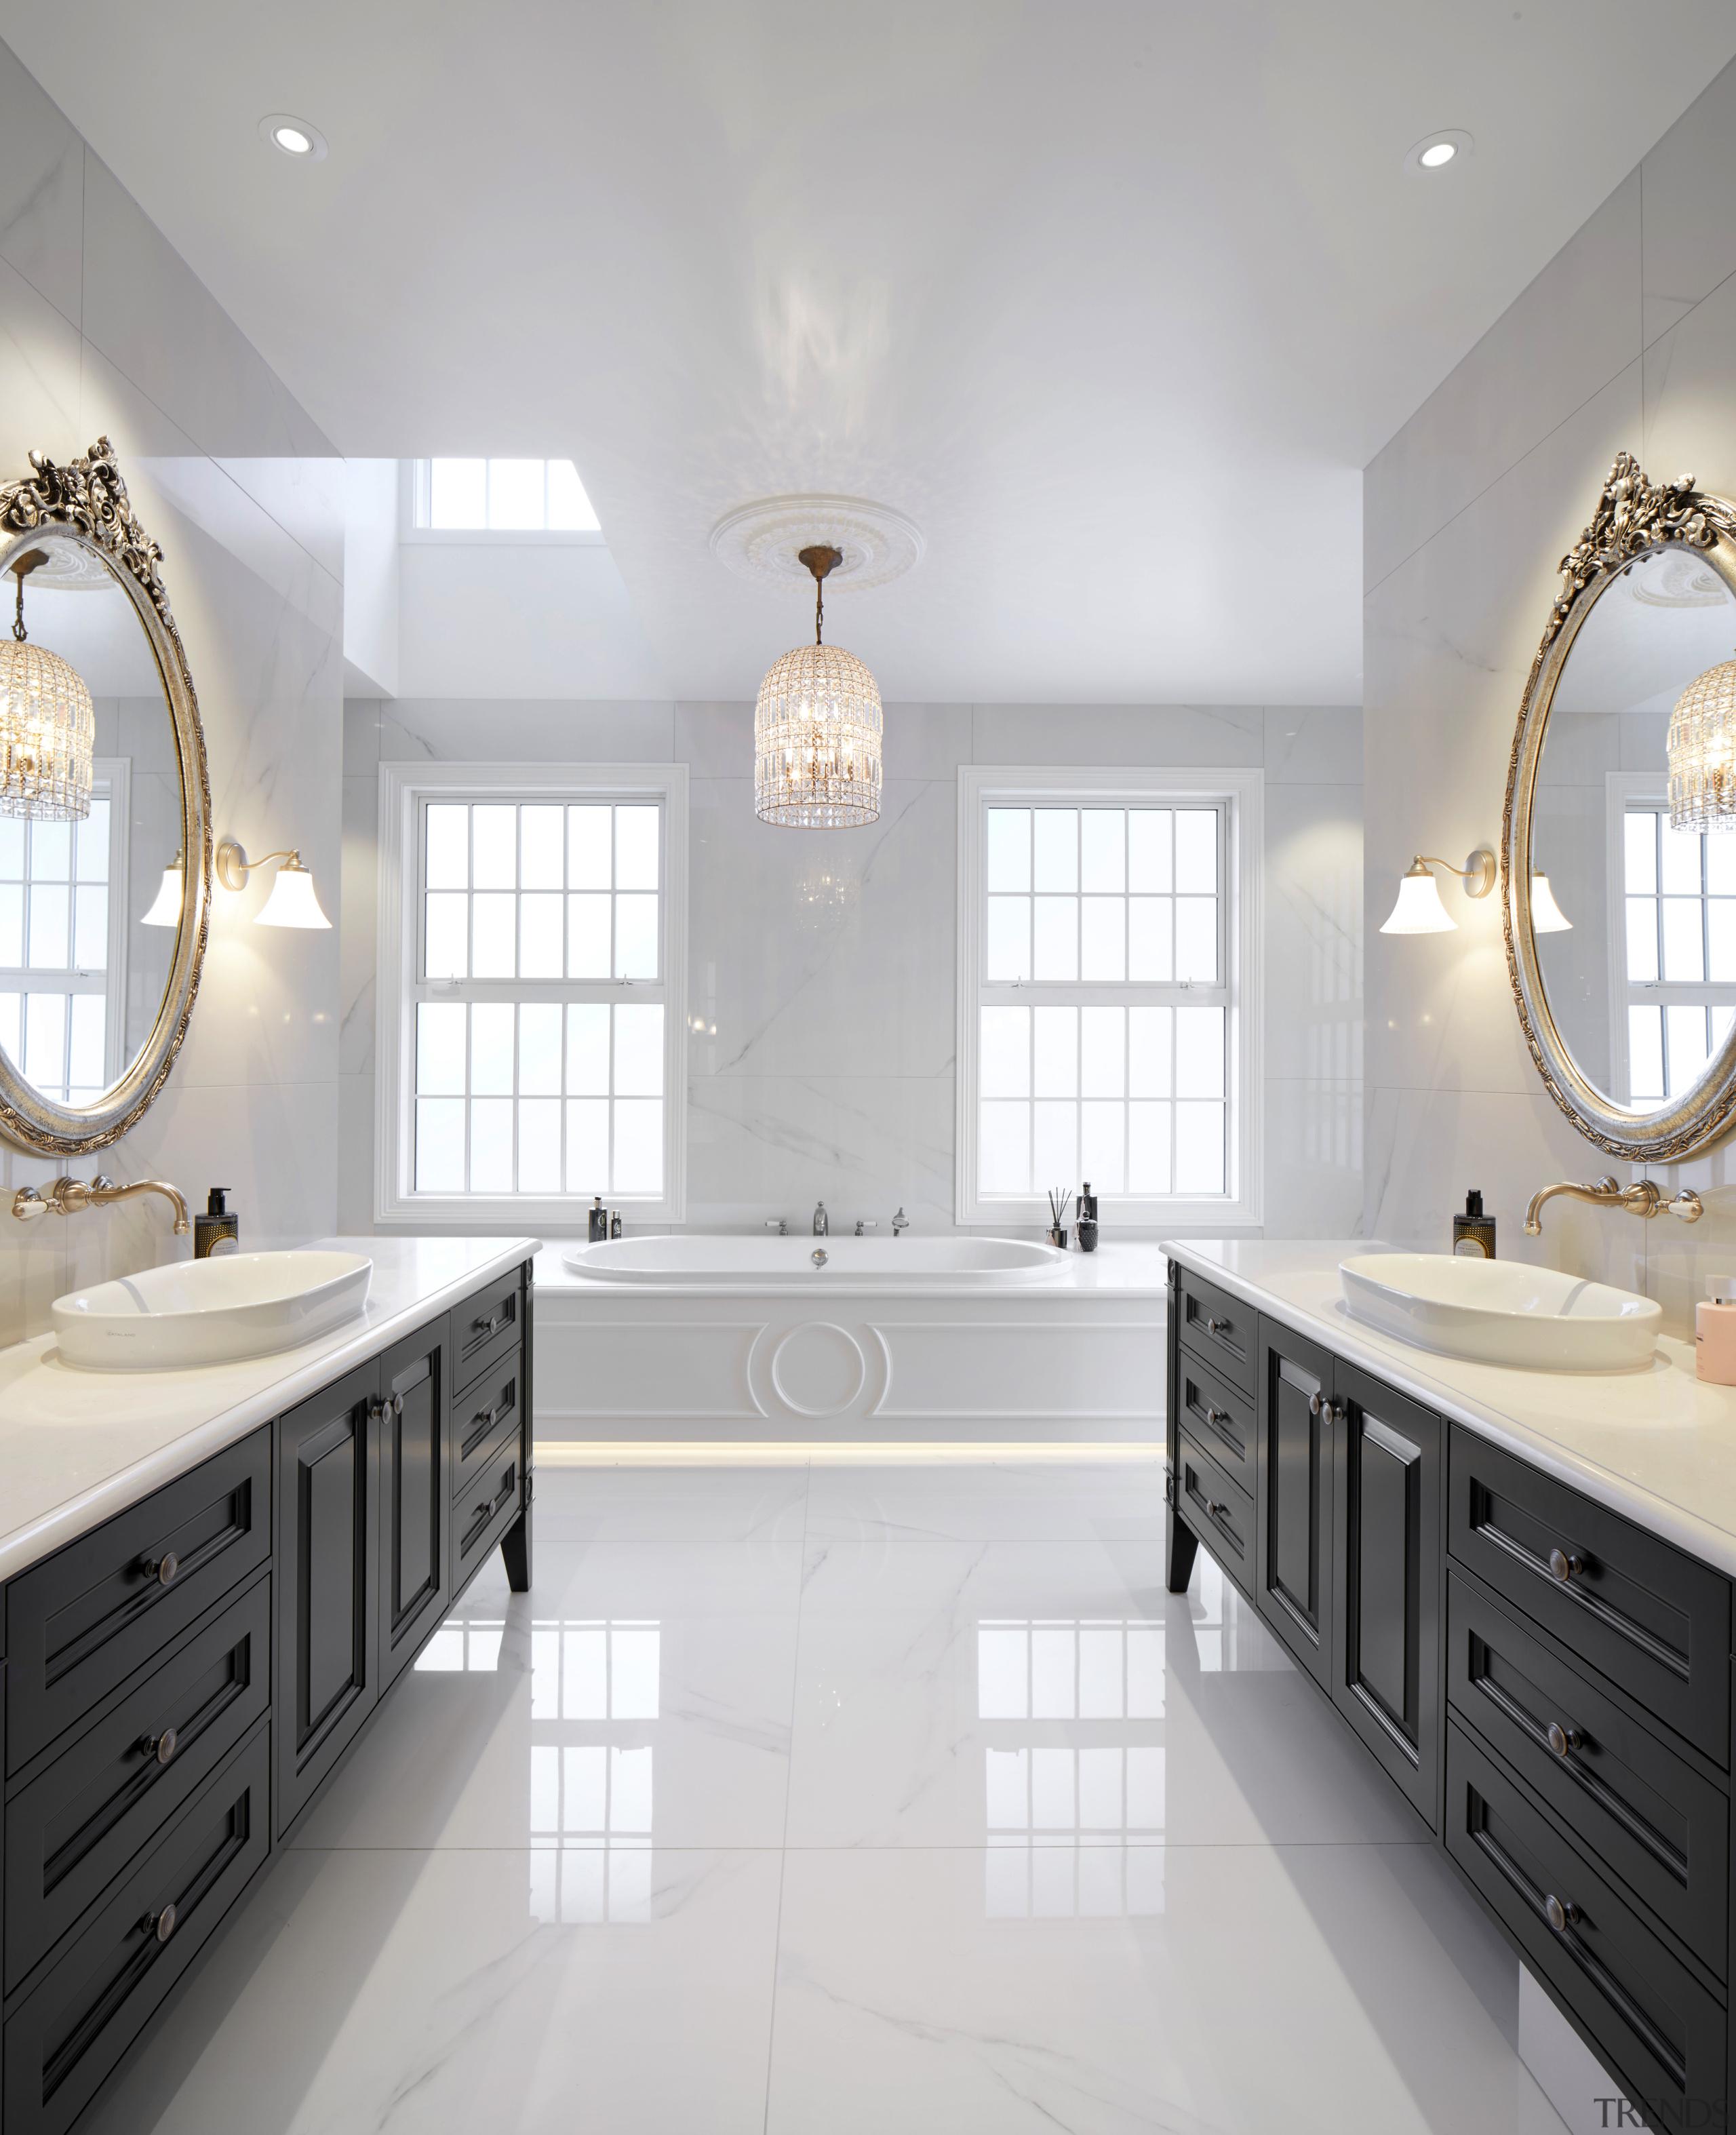 For the main ensuite in this new home, architecture, bathroom, bathroom accessory, bathroom cabinet, cabinetry, floor, flooring, marble, , plumbing fixture, tap, tile, gray, white, vanity, ingrid geldof design